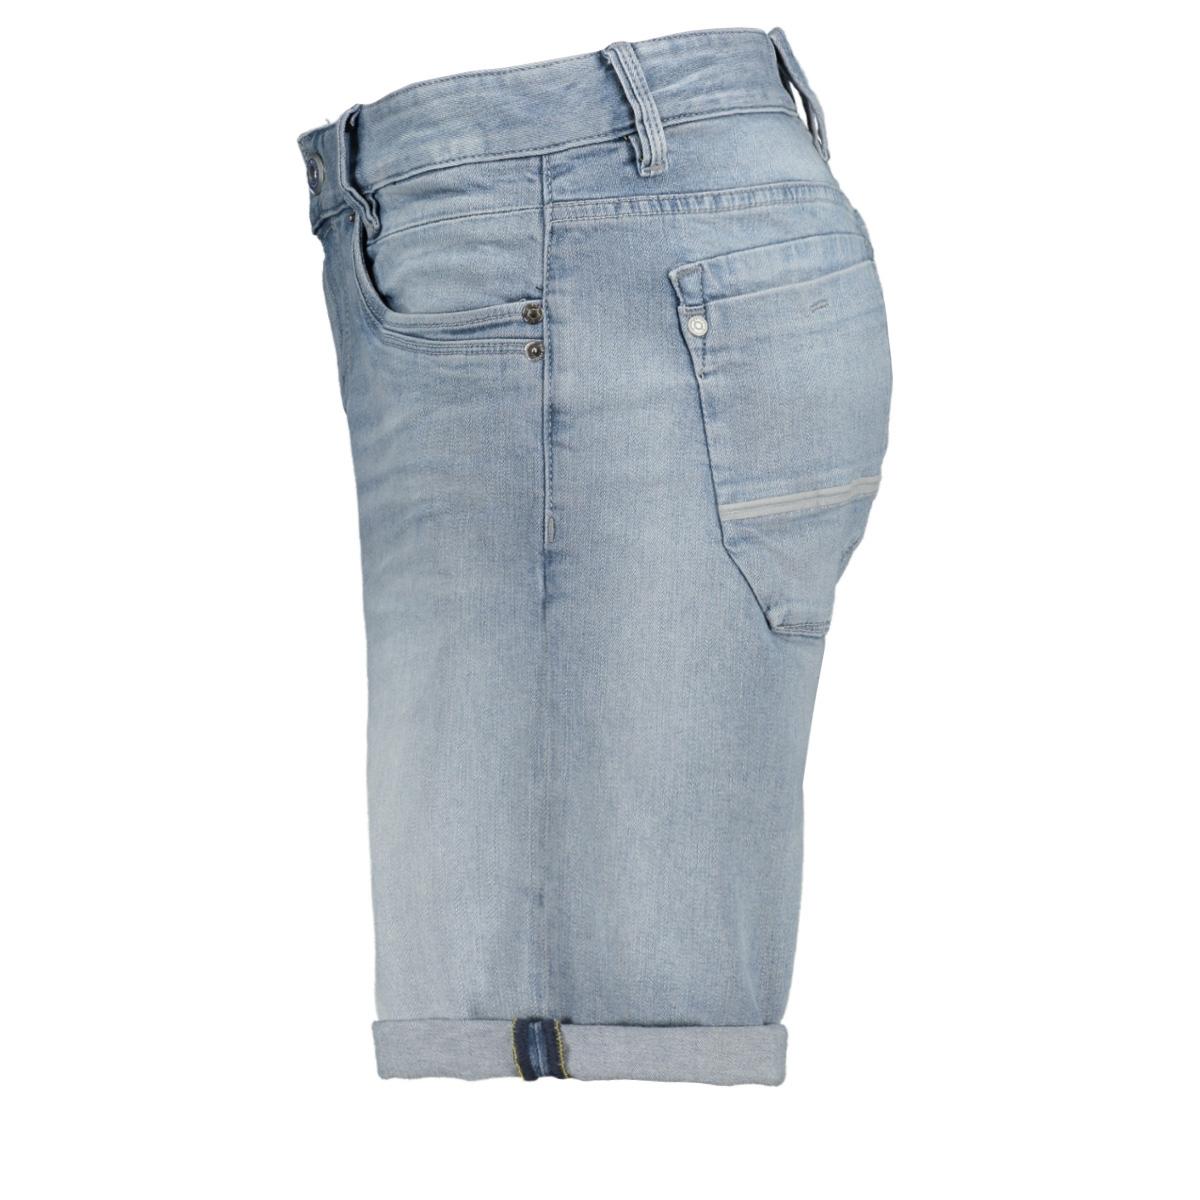 skymaster shorts summer grey bleached psh202757 pme legend